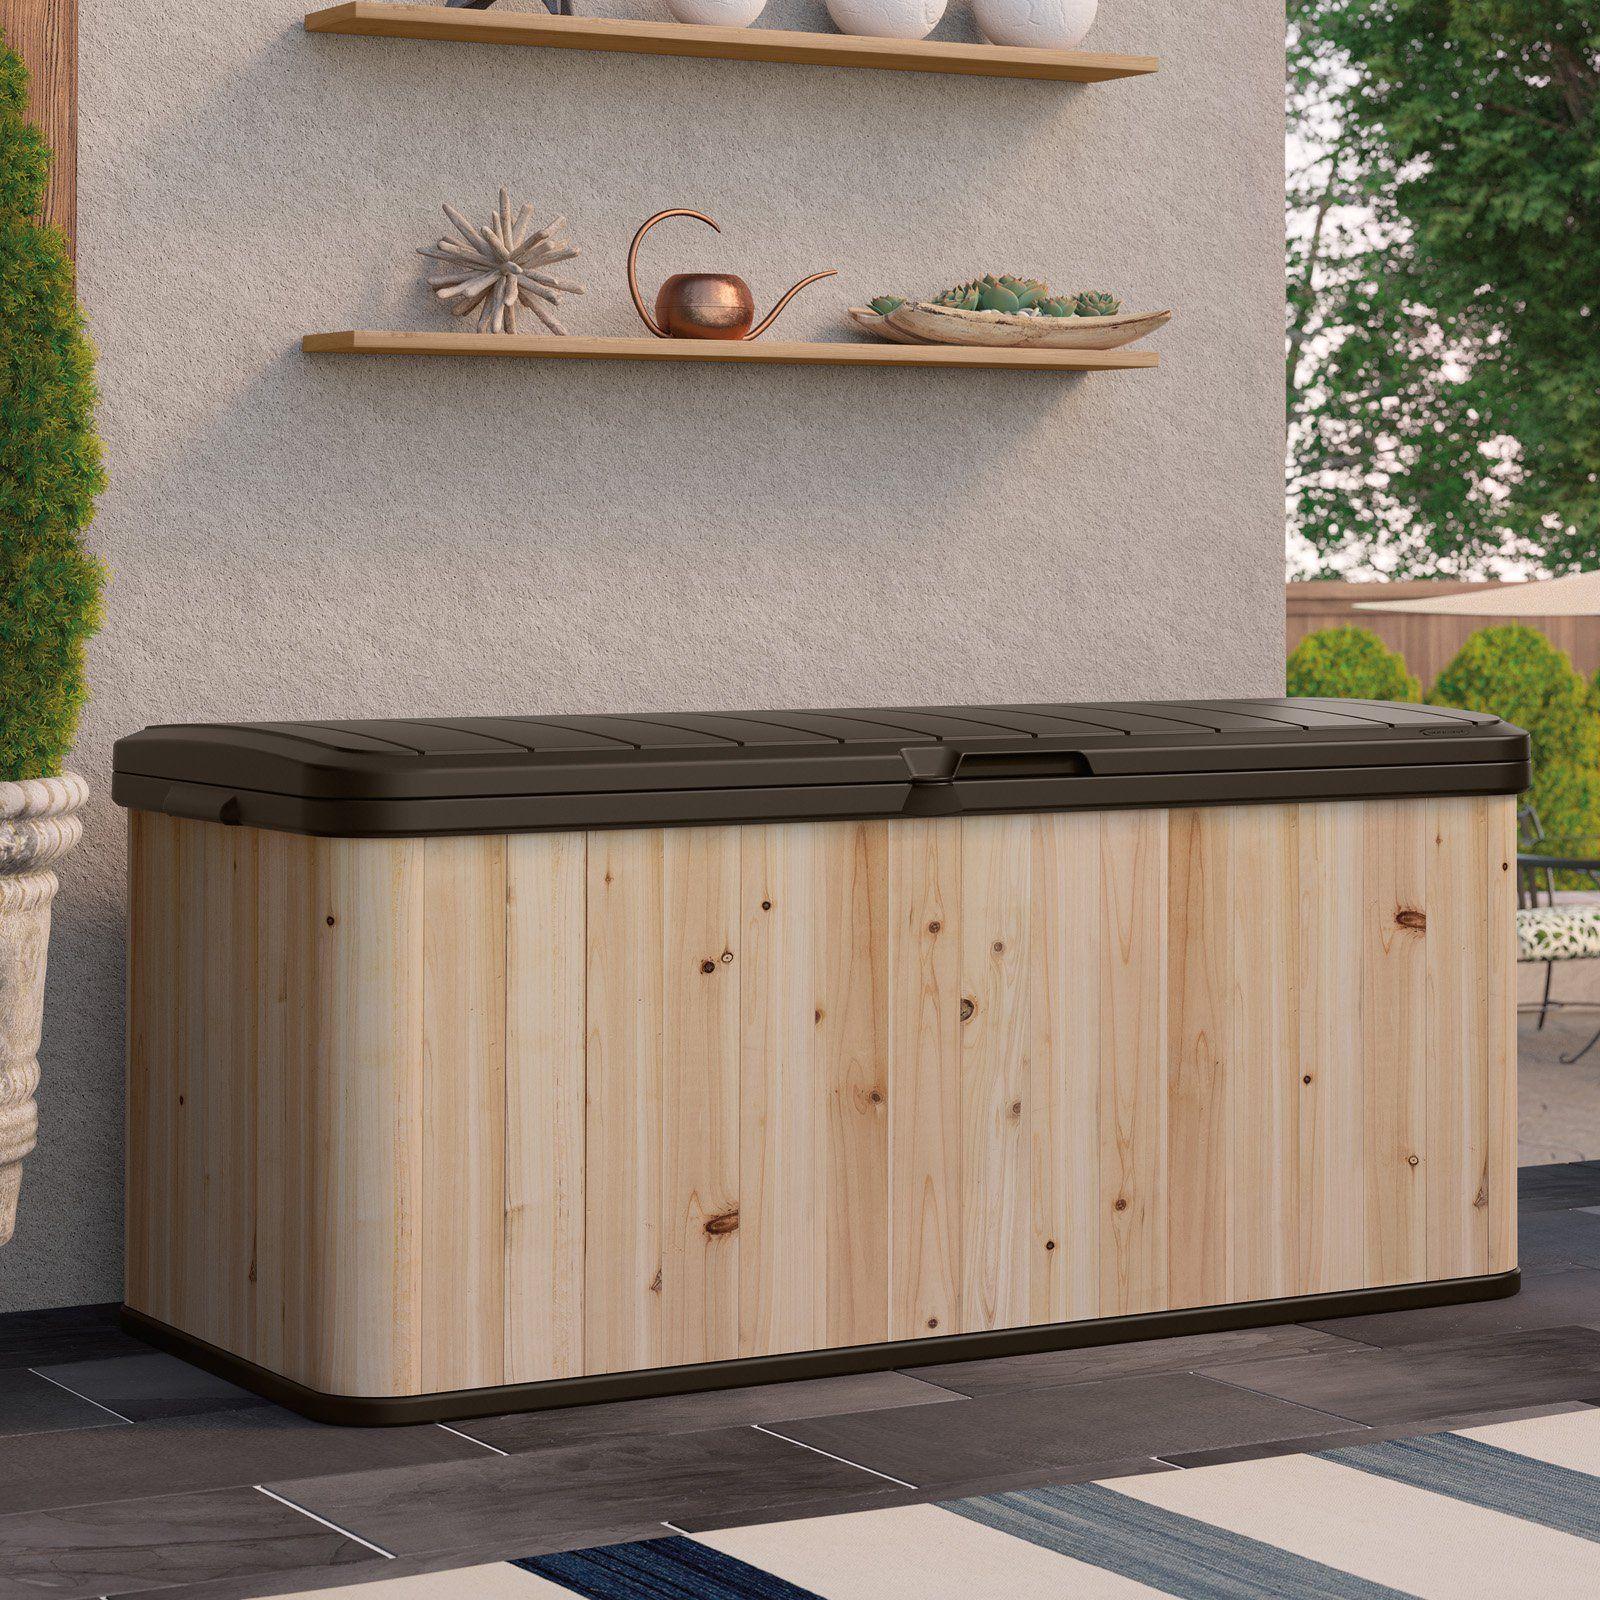 Suncast Extra Large Cedar And Plastic 120 Gallon Deck Box Wrdb12000 Resin Deck Box Patio Storage Deck Box Storage